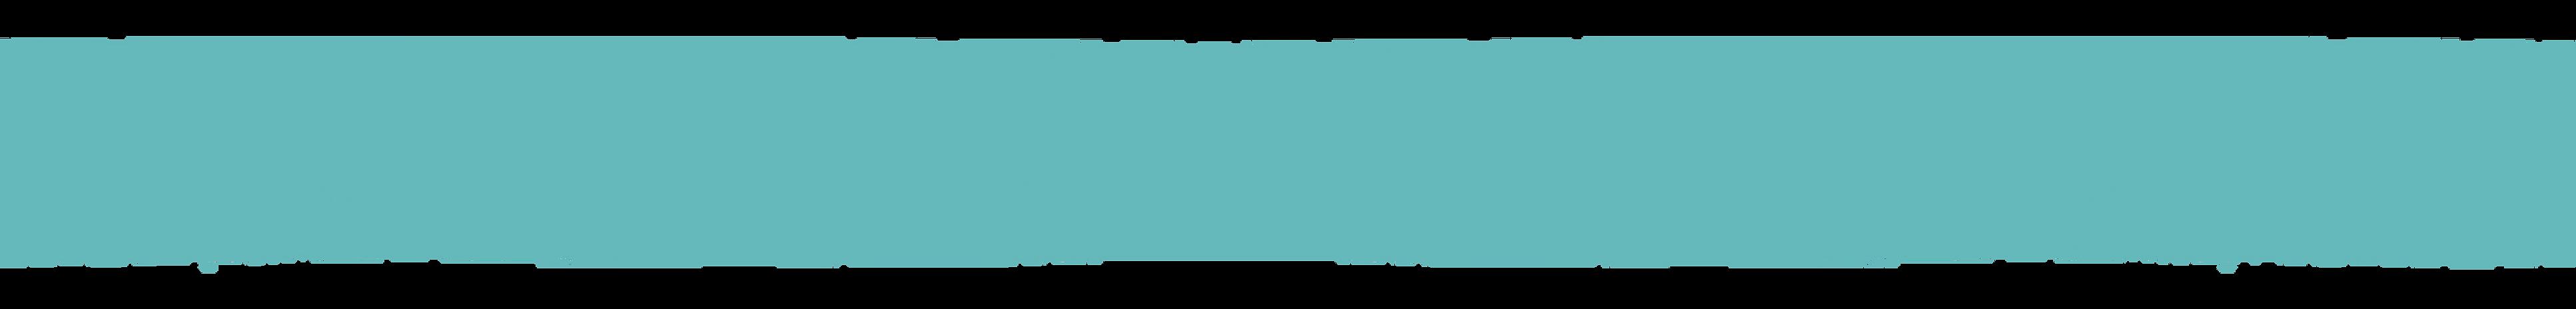 Franja-color-corporativo-2.png